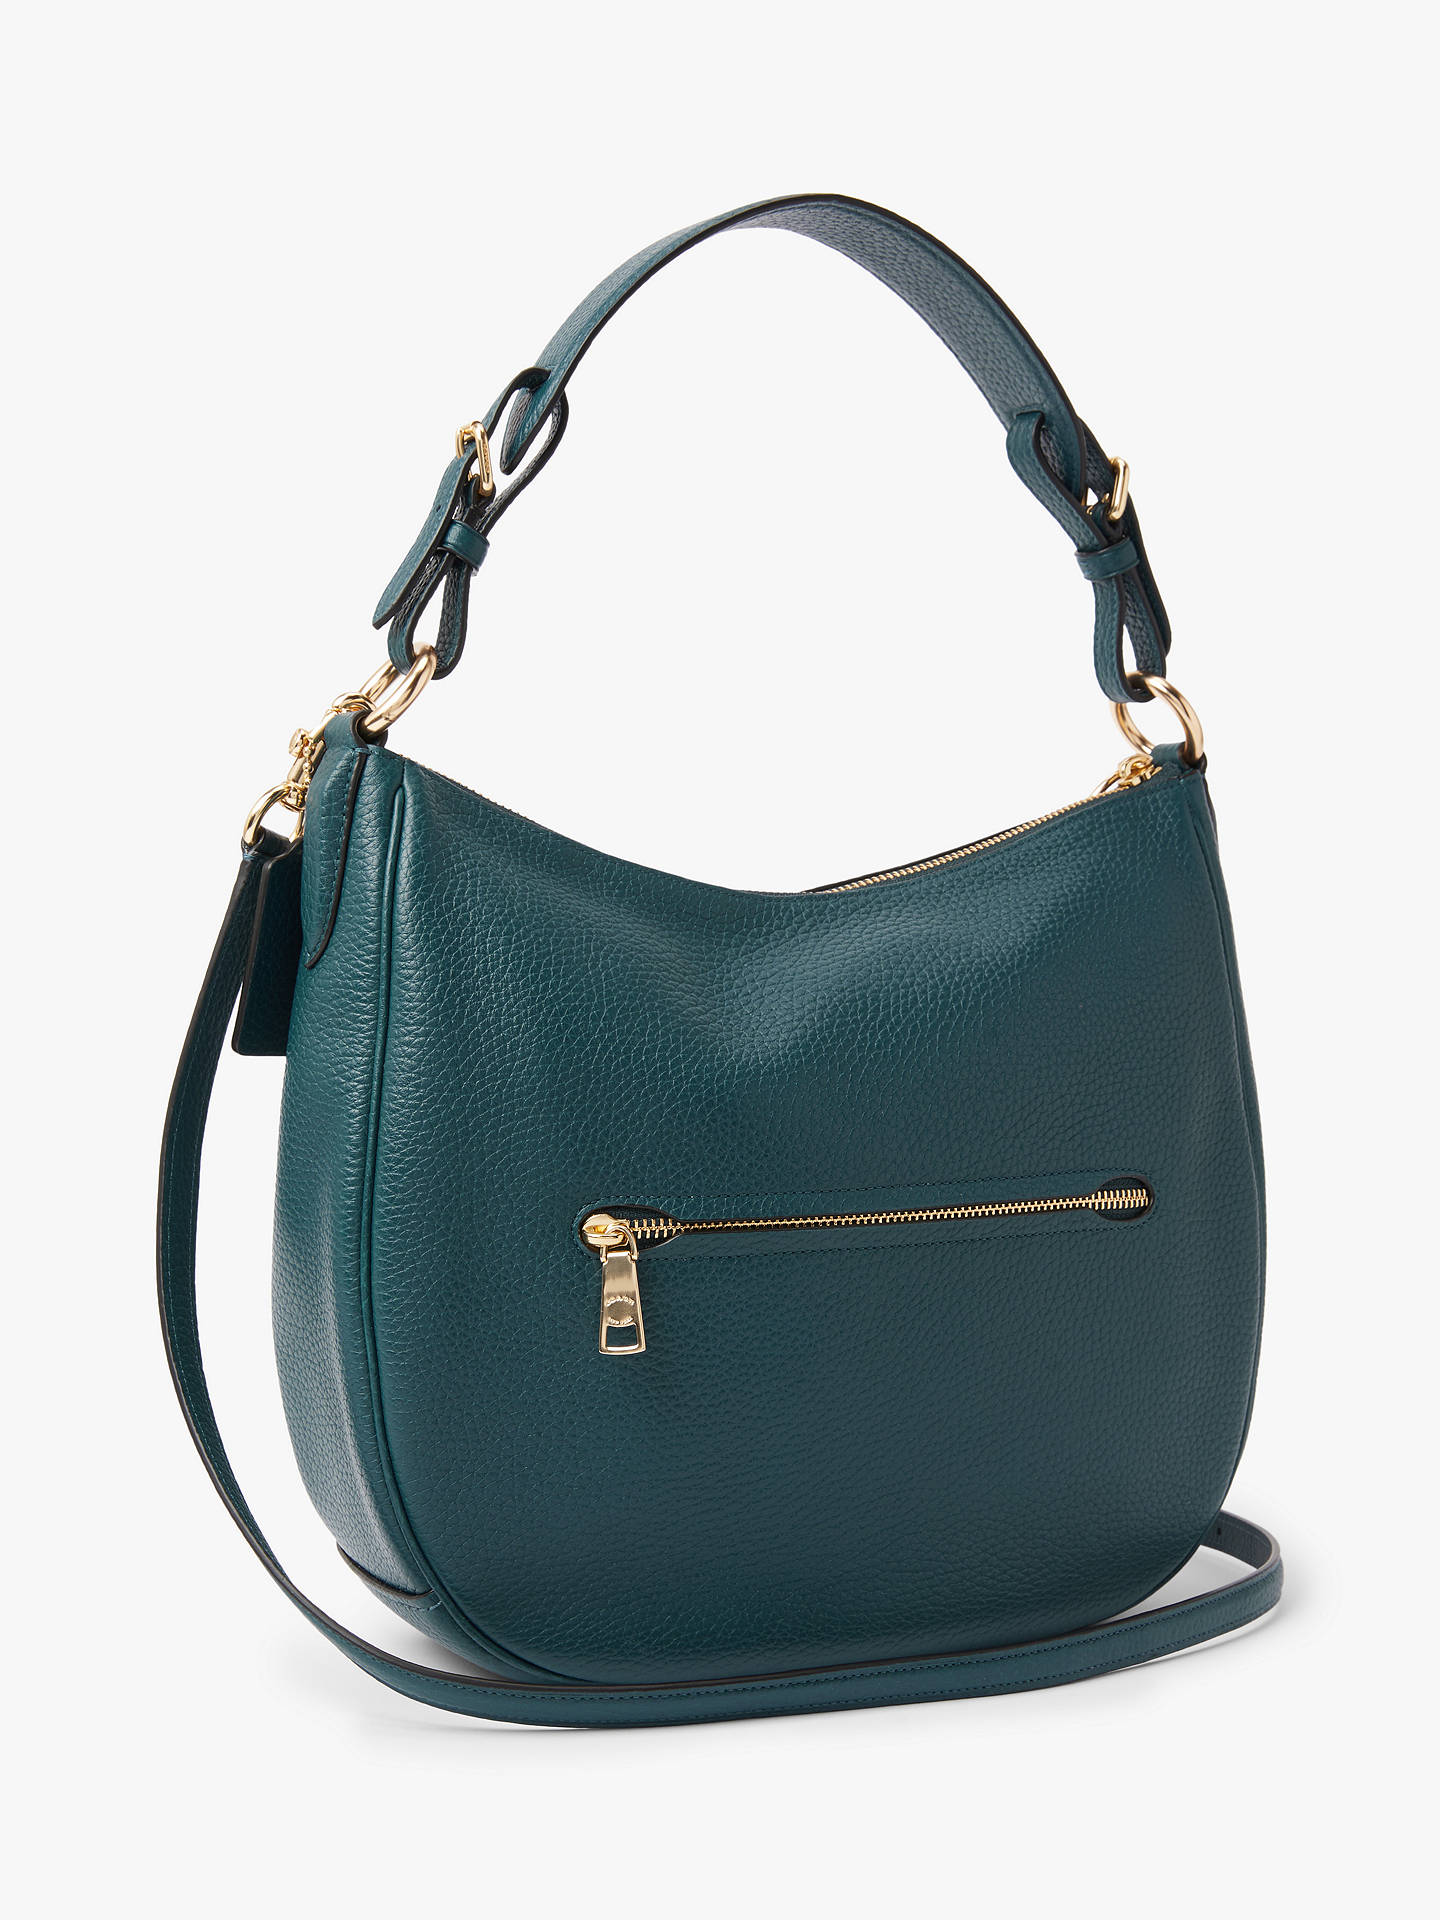 05ec899e9225d ... Buy Coach Sutton Pebbled Leather Hobo Bag, Peacock Online at  johnlewis.com ...